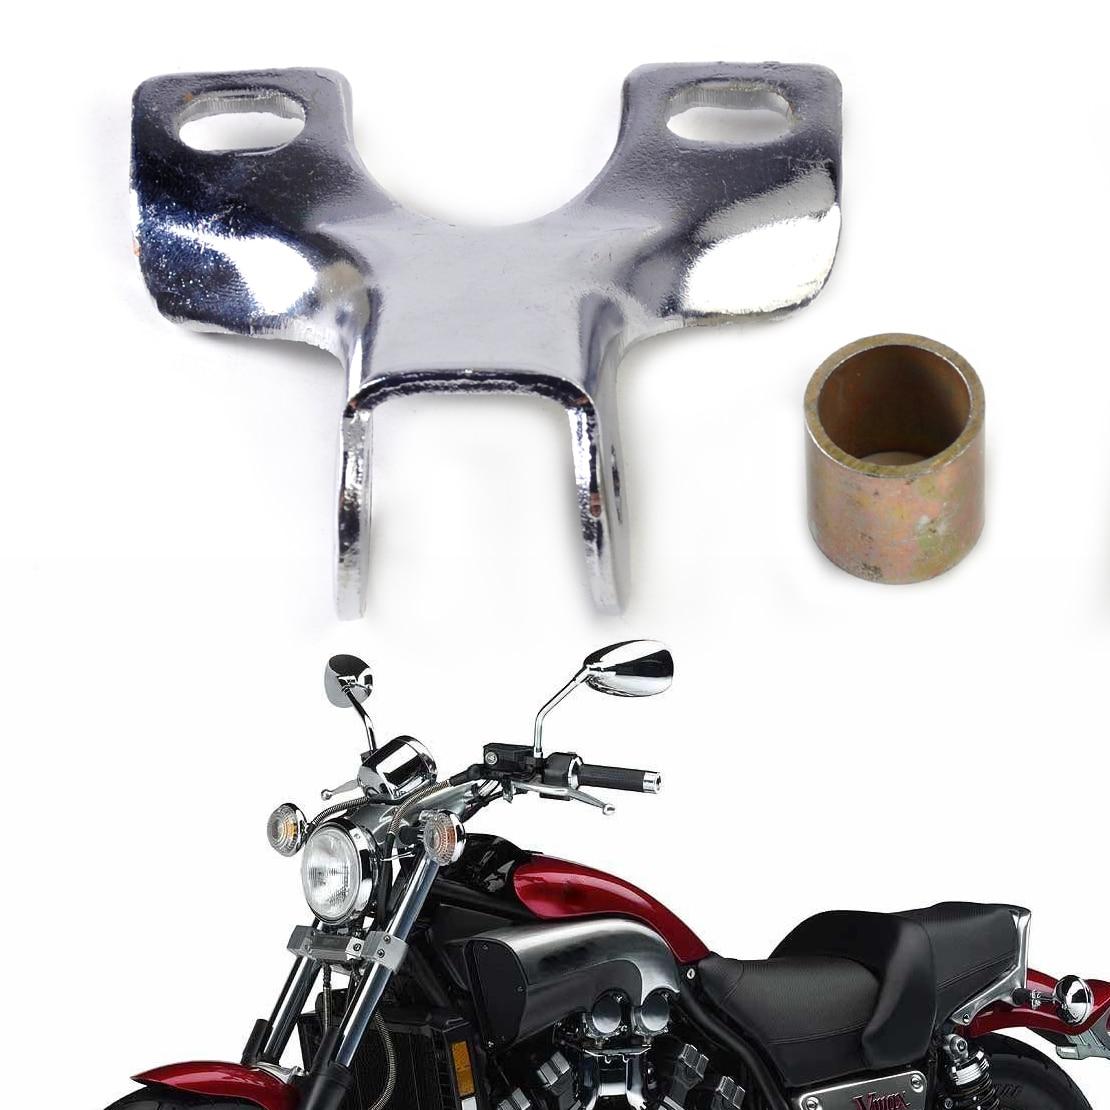 CITALL Motorcycle Chrome Headlight Bracket Bottom Mount Holder For Harley Cruiser Chopper Custom Scooter Kawasaki Honda Suzuki